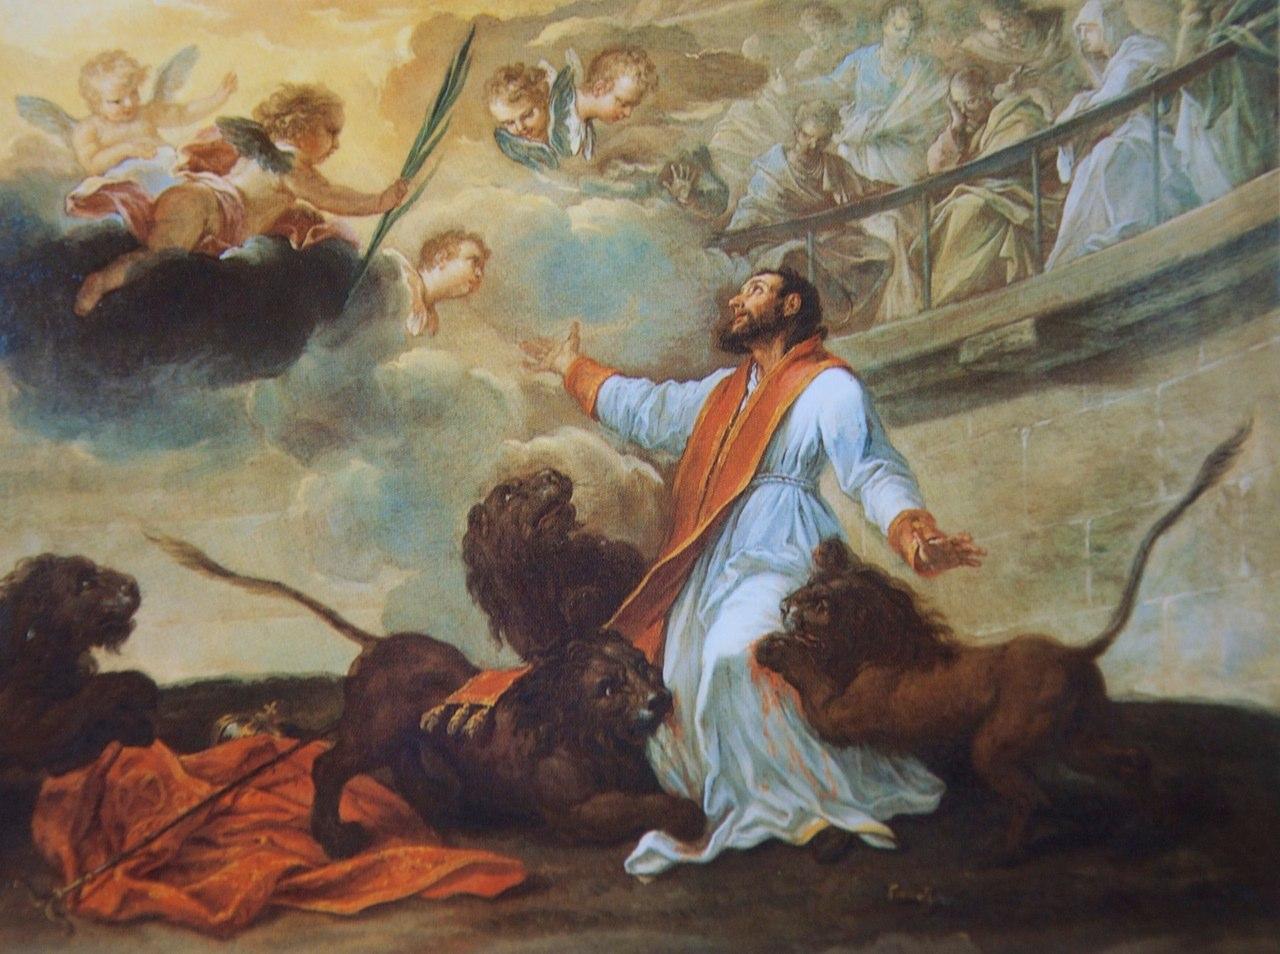 https://www.thefaithexplained.com/content/uploads/2019/10/Martyrdom-of-Ignatius-of-Antioch.jpg